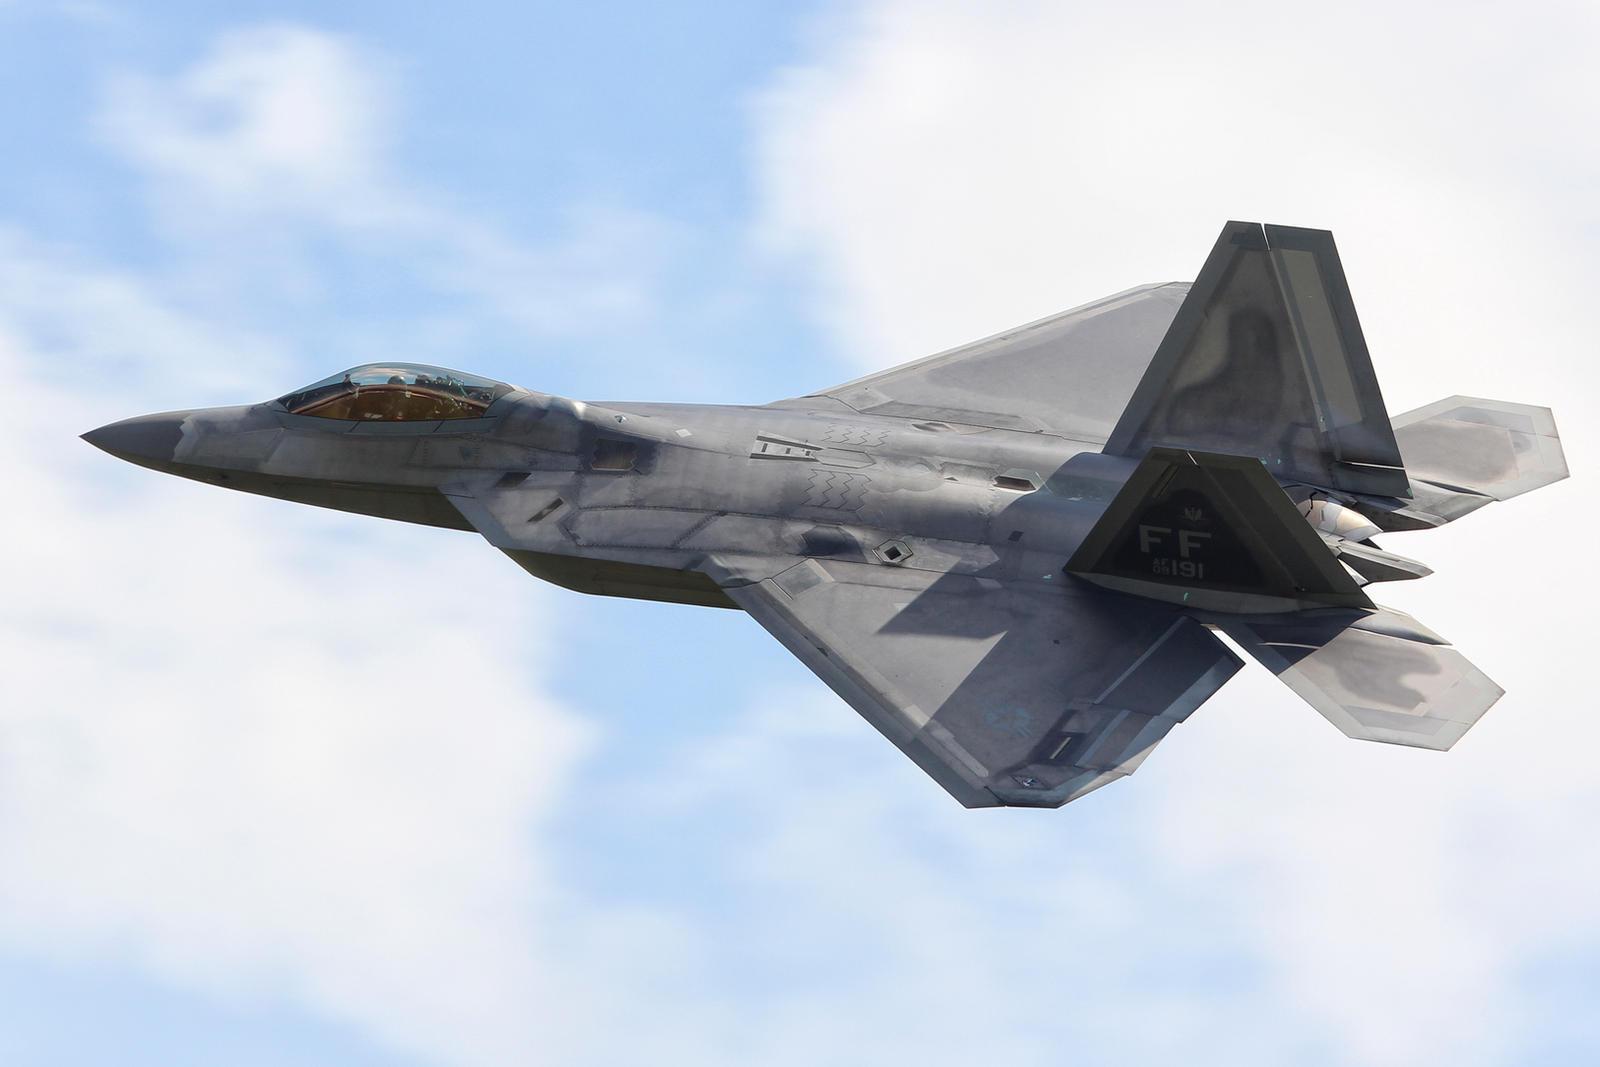 Lockheed Martin F-22A Raptor by Daniel-Wales-Images